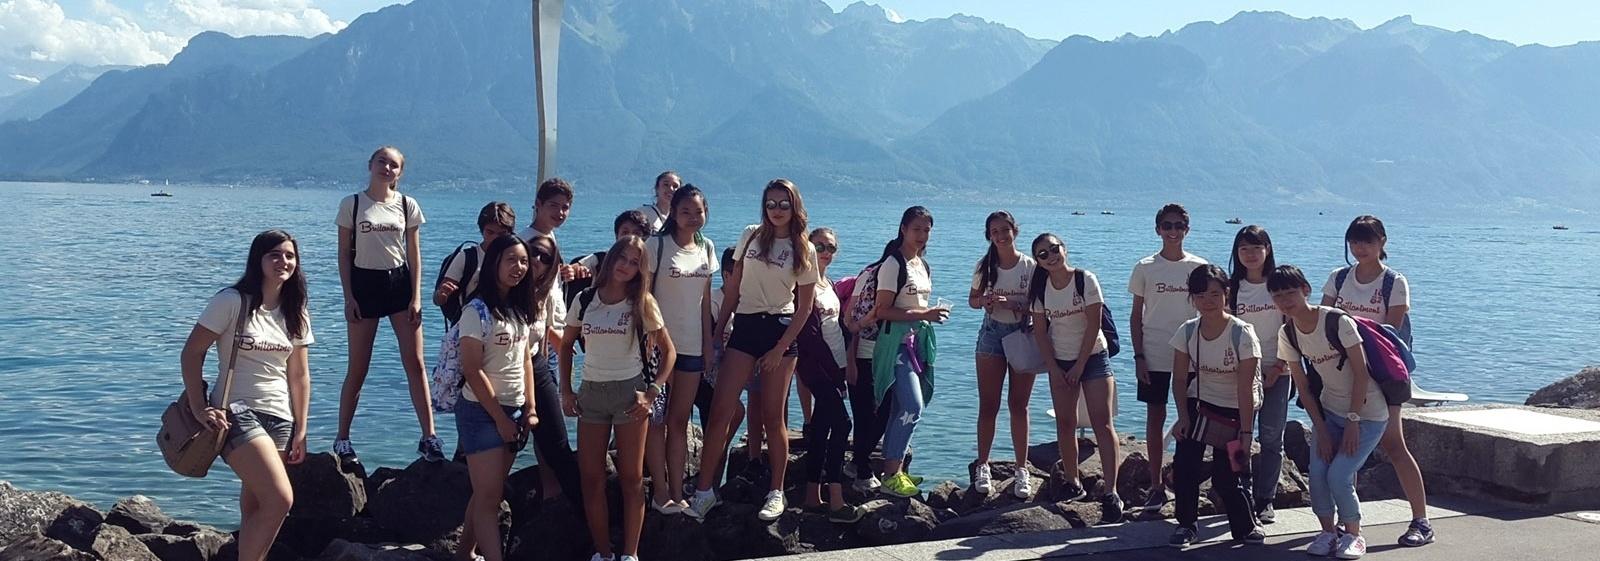 201-Vevey-Brillantmont-Summer-Course